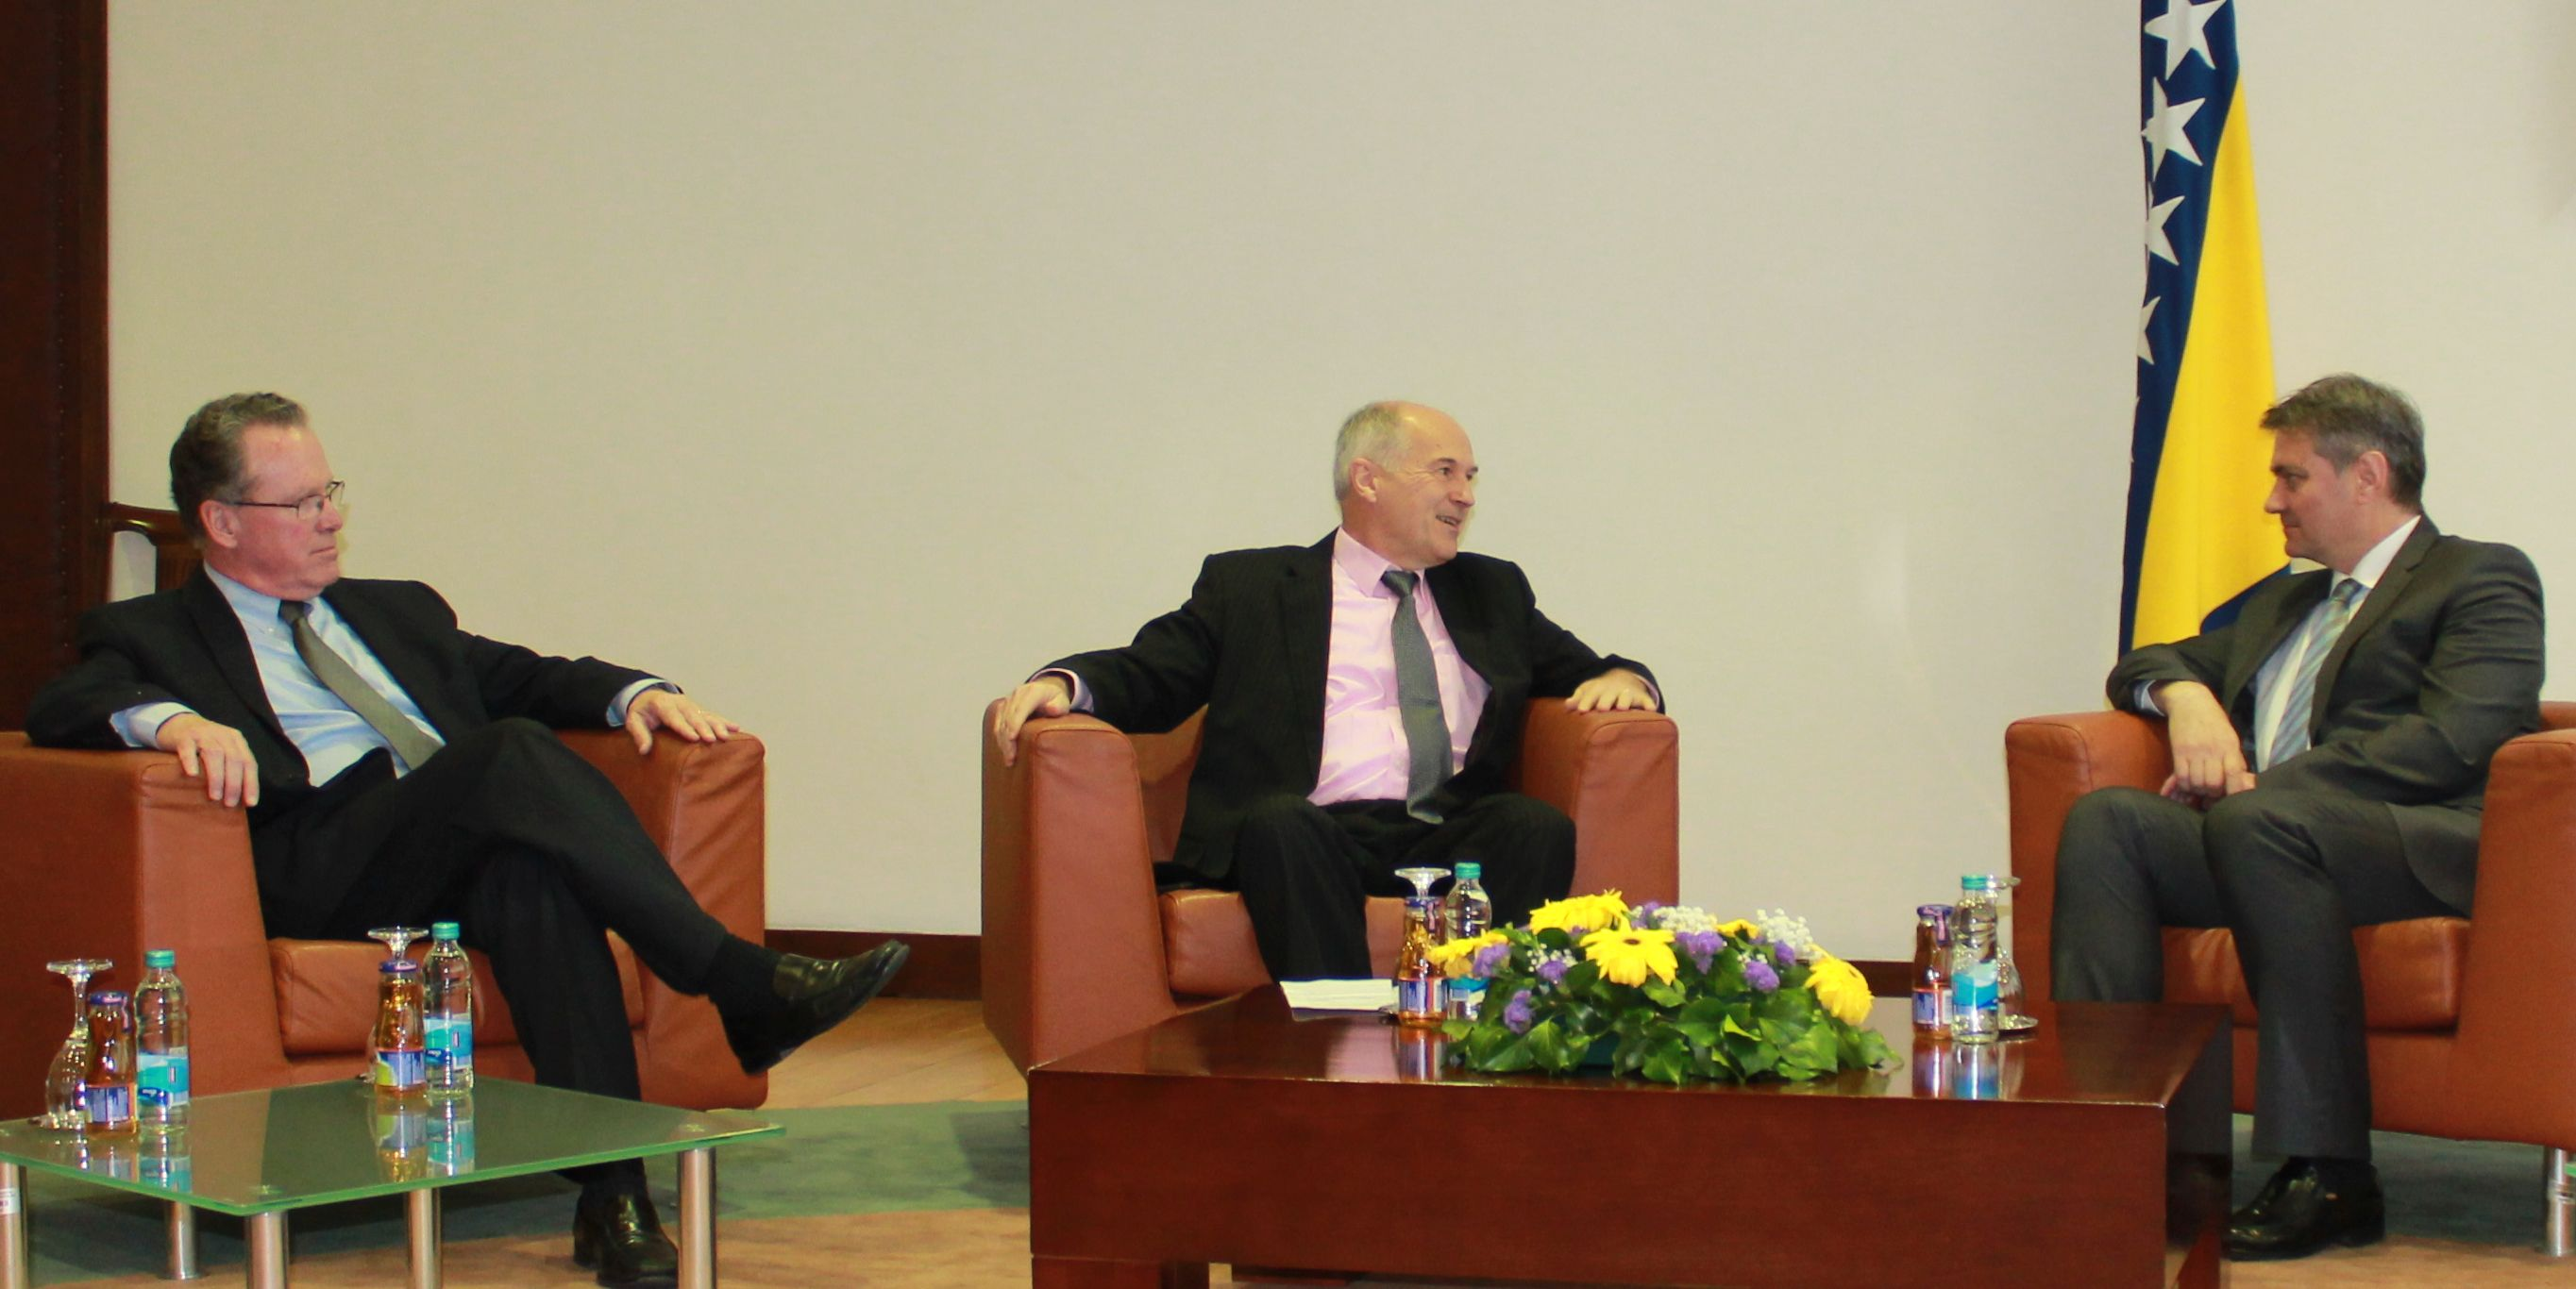 Zvizdic: EU integration an absolute priority